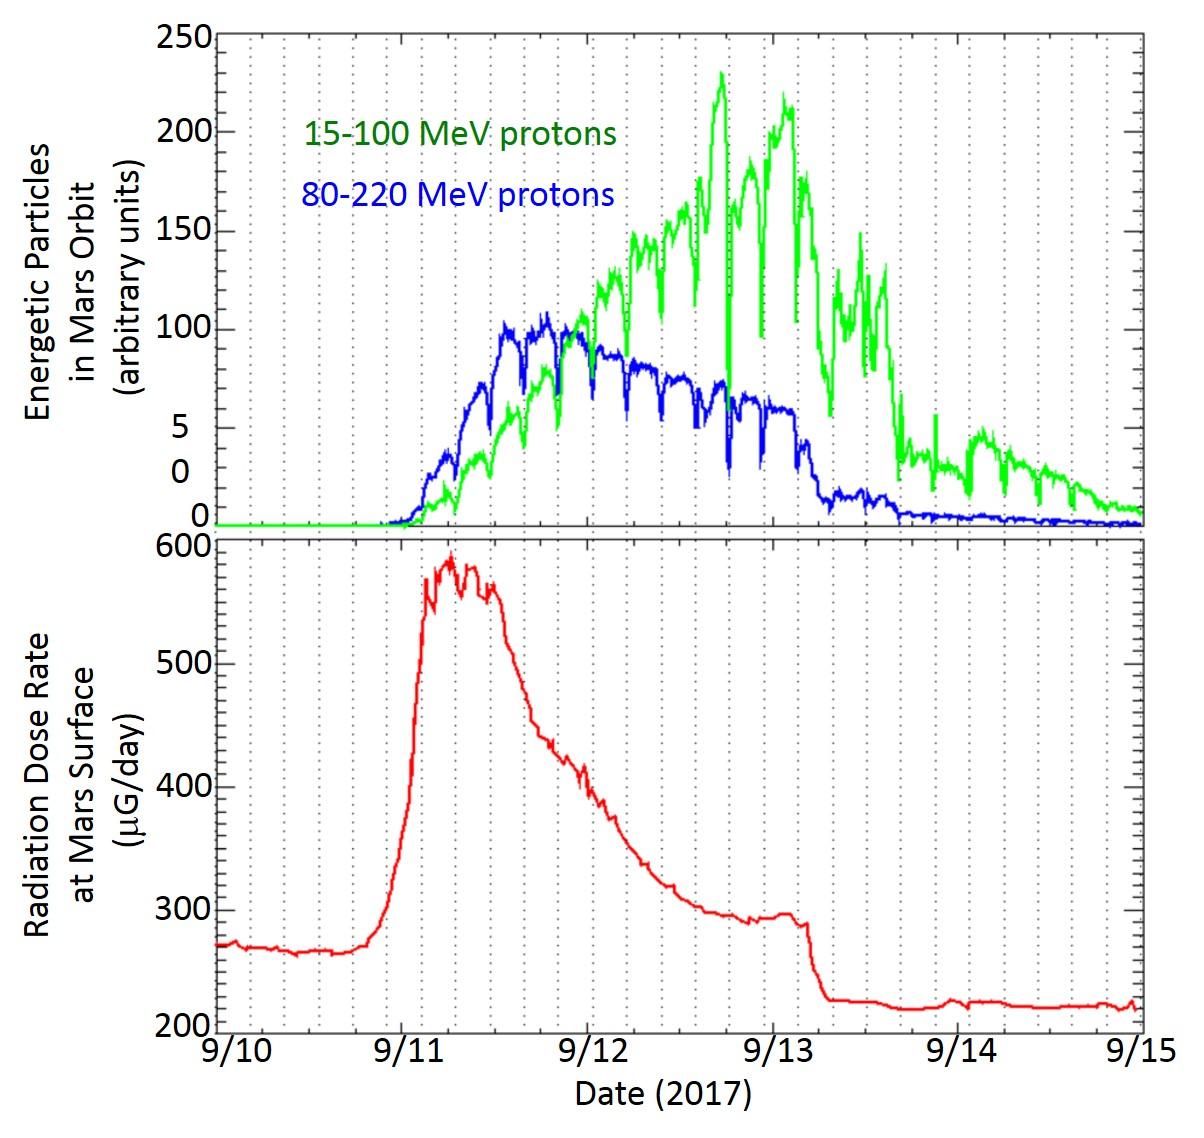 Solar Storm Sparks Global Aurora Doubles Radiation Levels